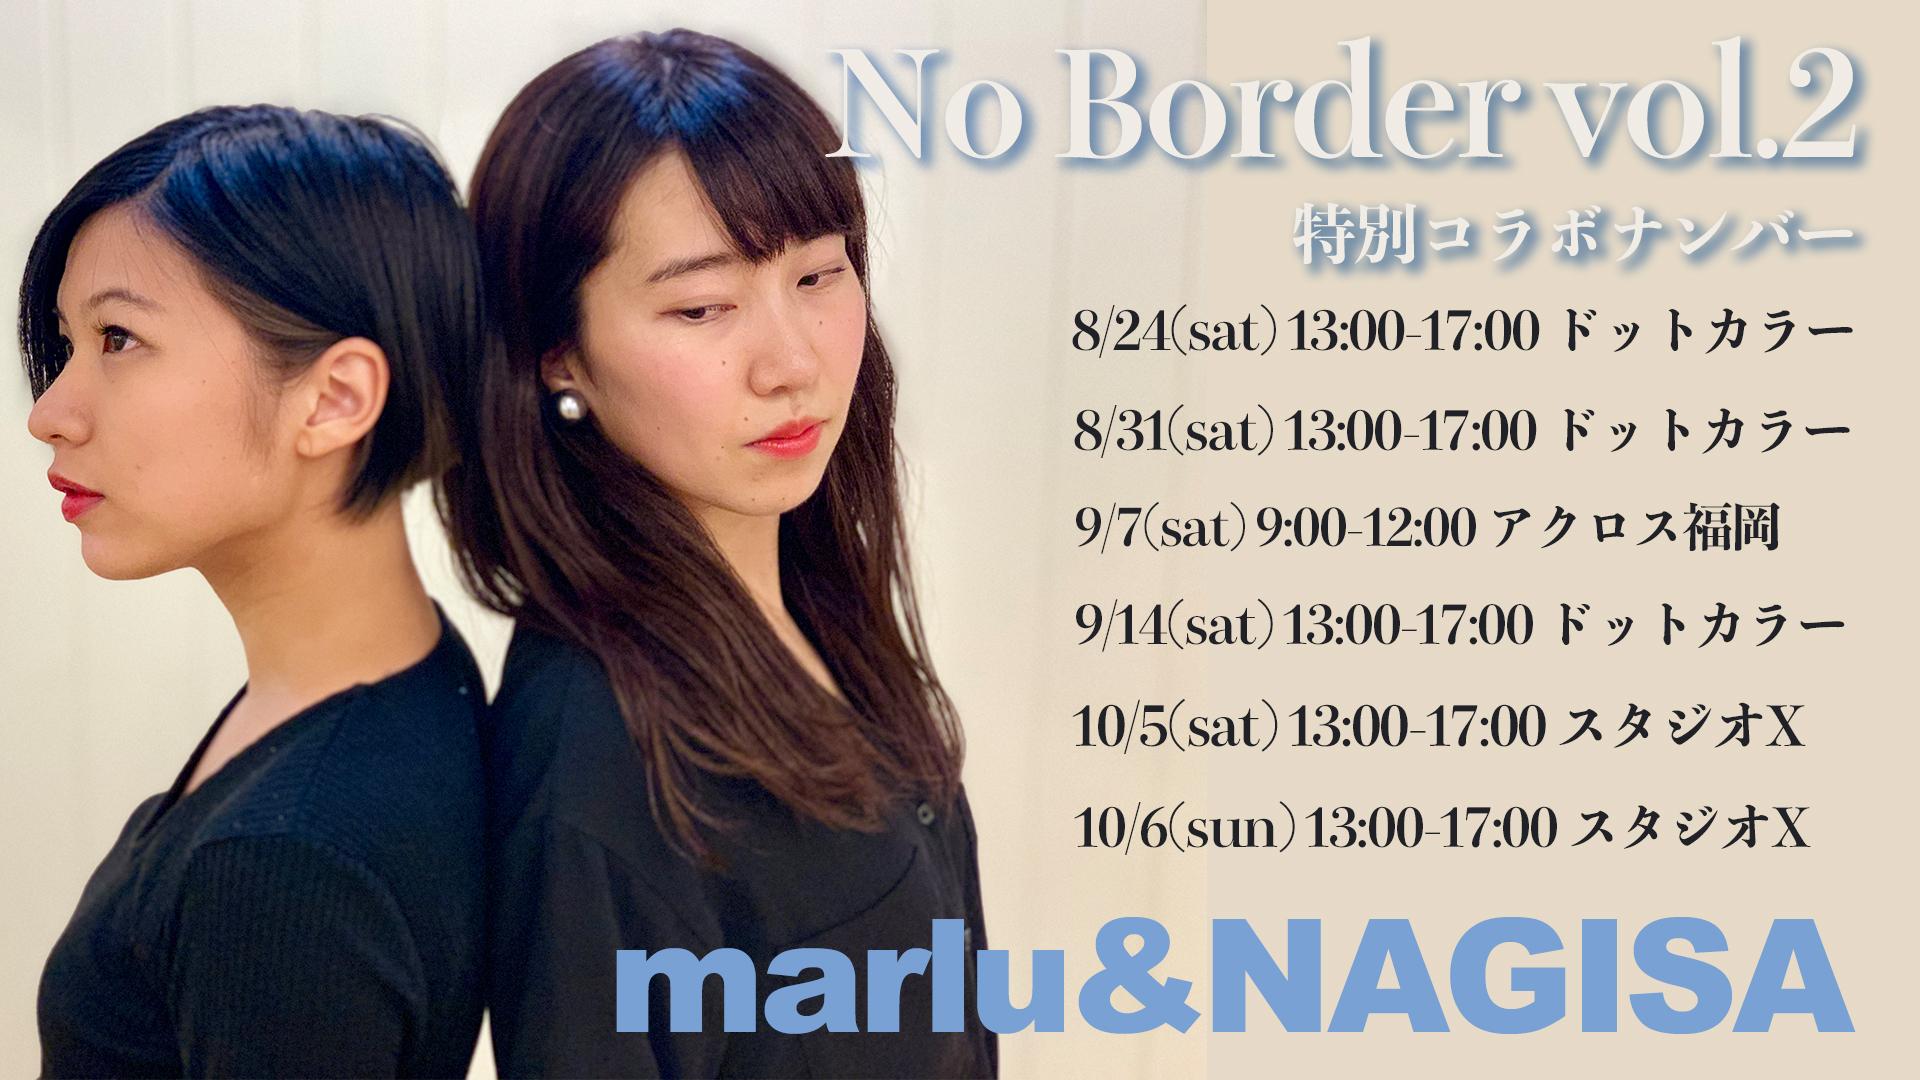 No Border.vol2 特別ナンバーのお知らせ第二弾!なんと「marlu&NAGISA」のナンバーが実現!福岡でダンスイベントといえばNo Border!